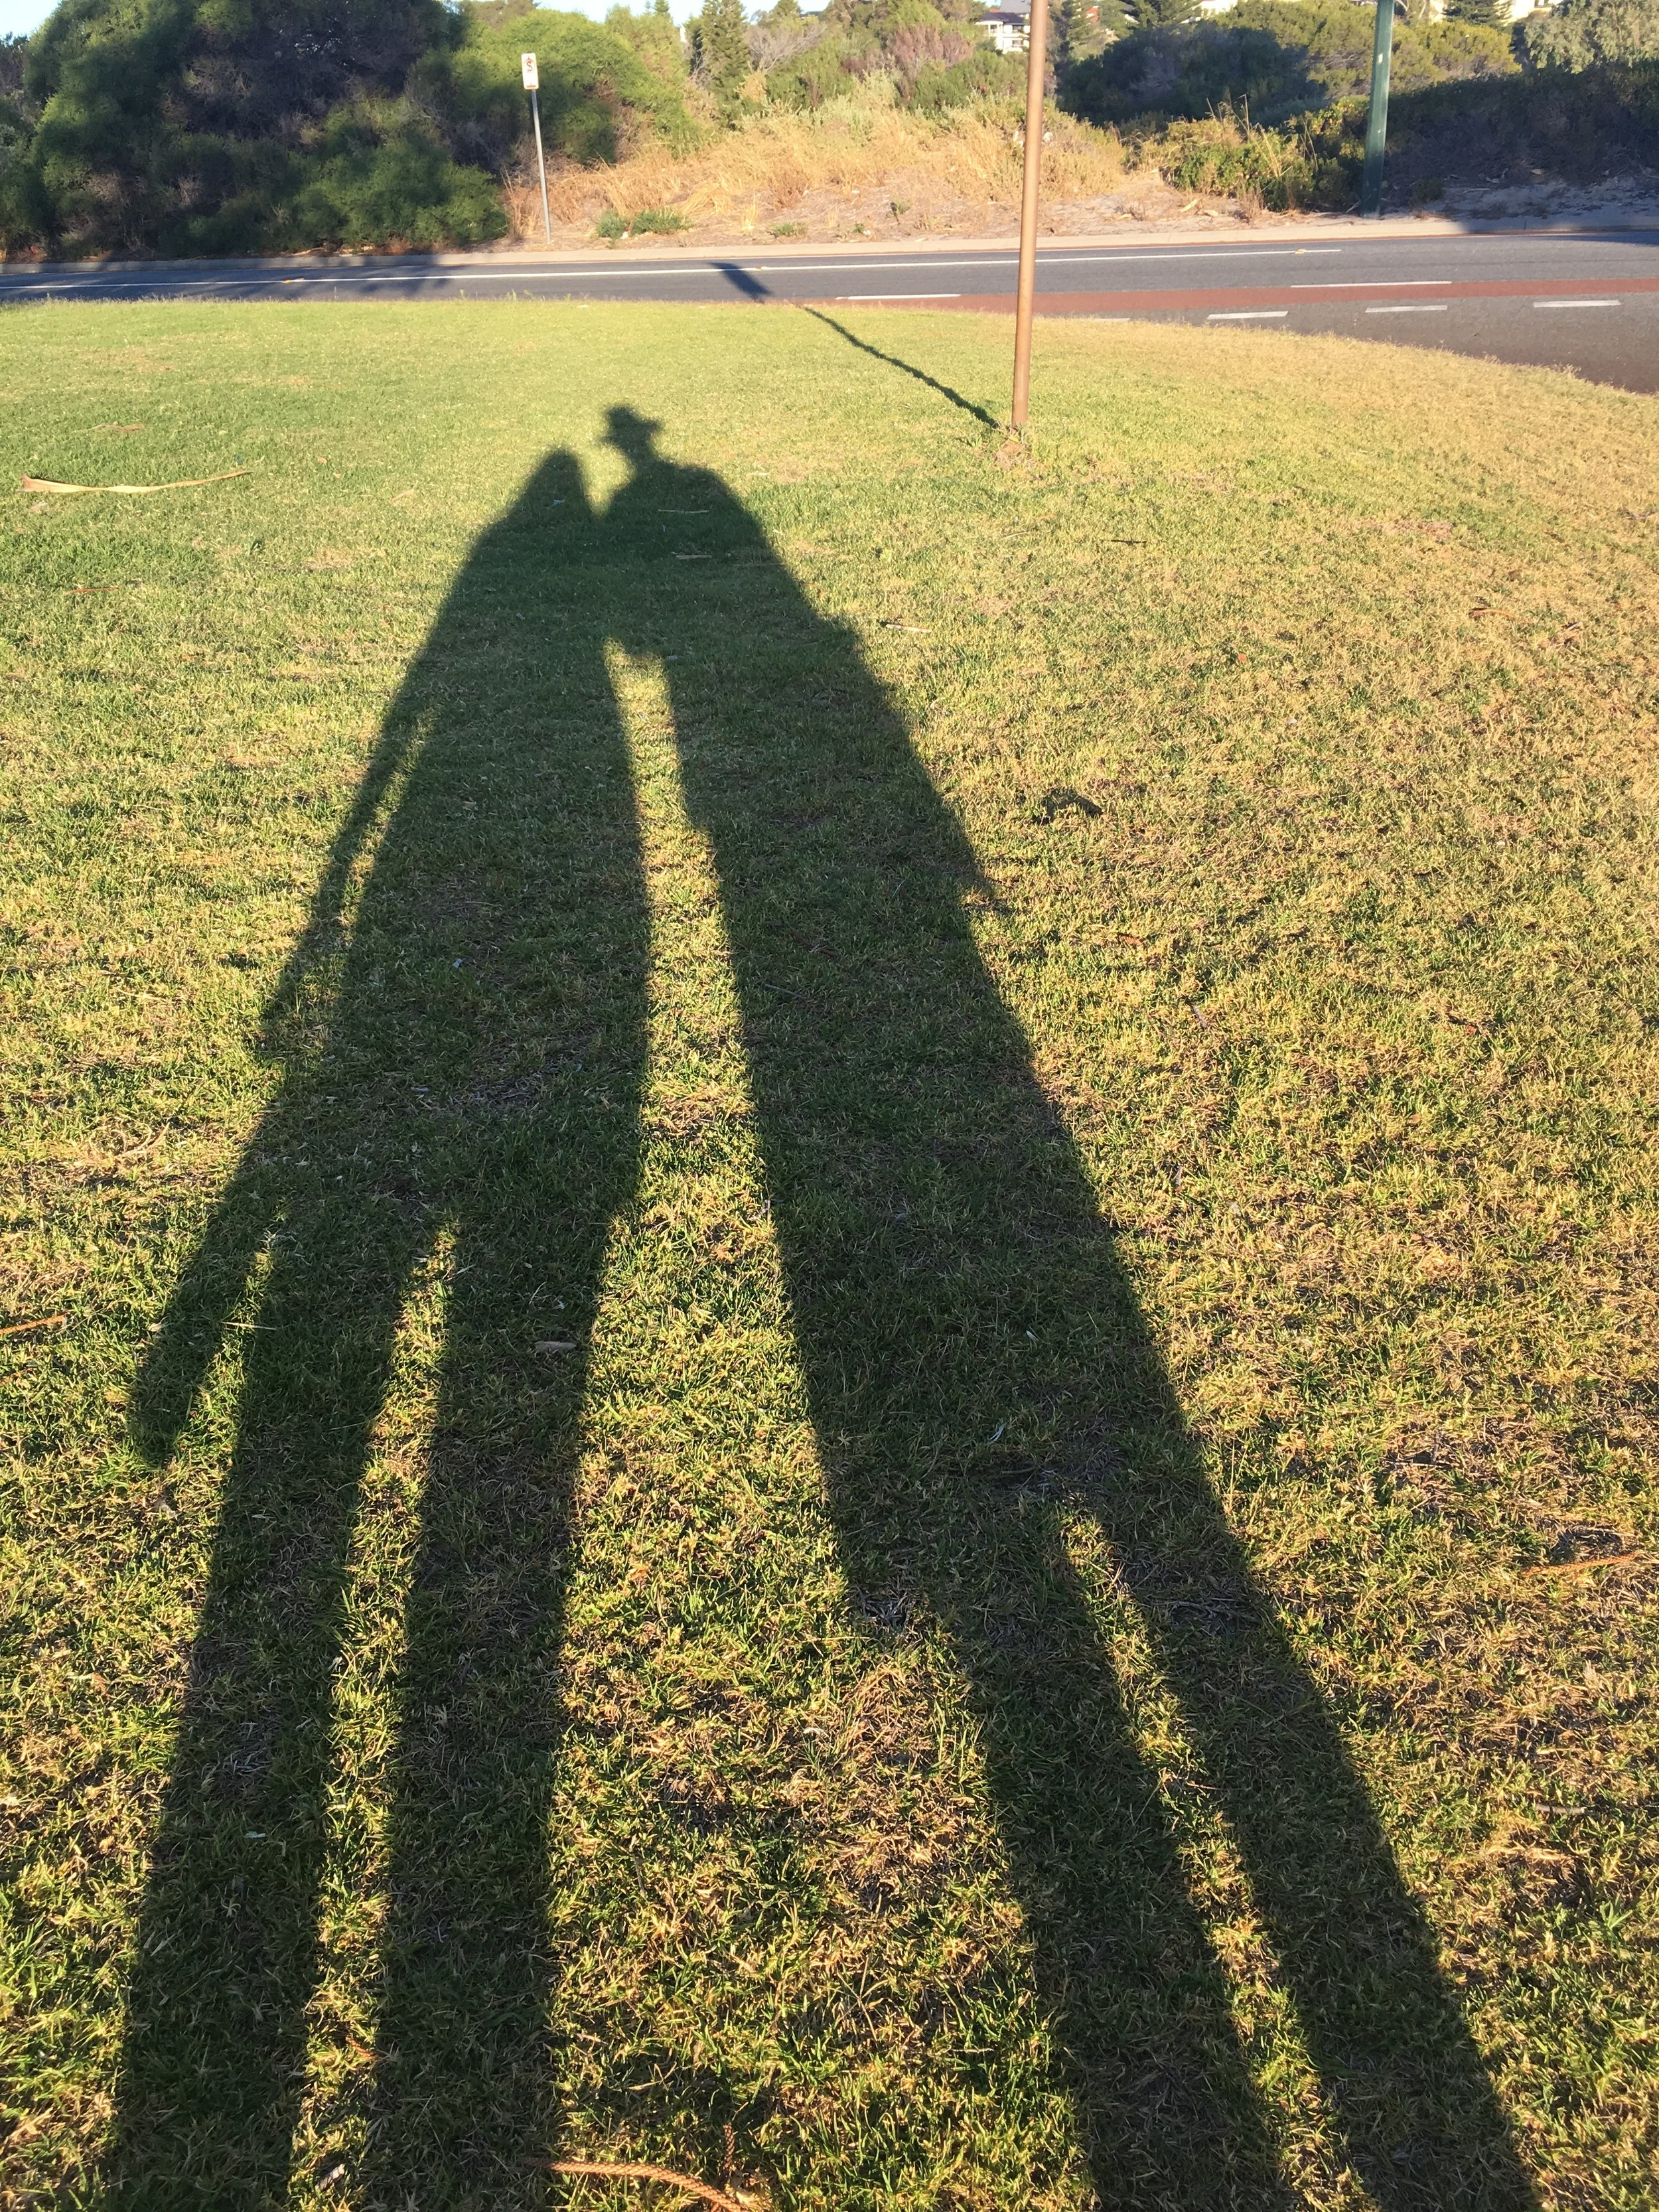 me & Freddy Krueger!